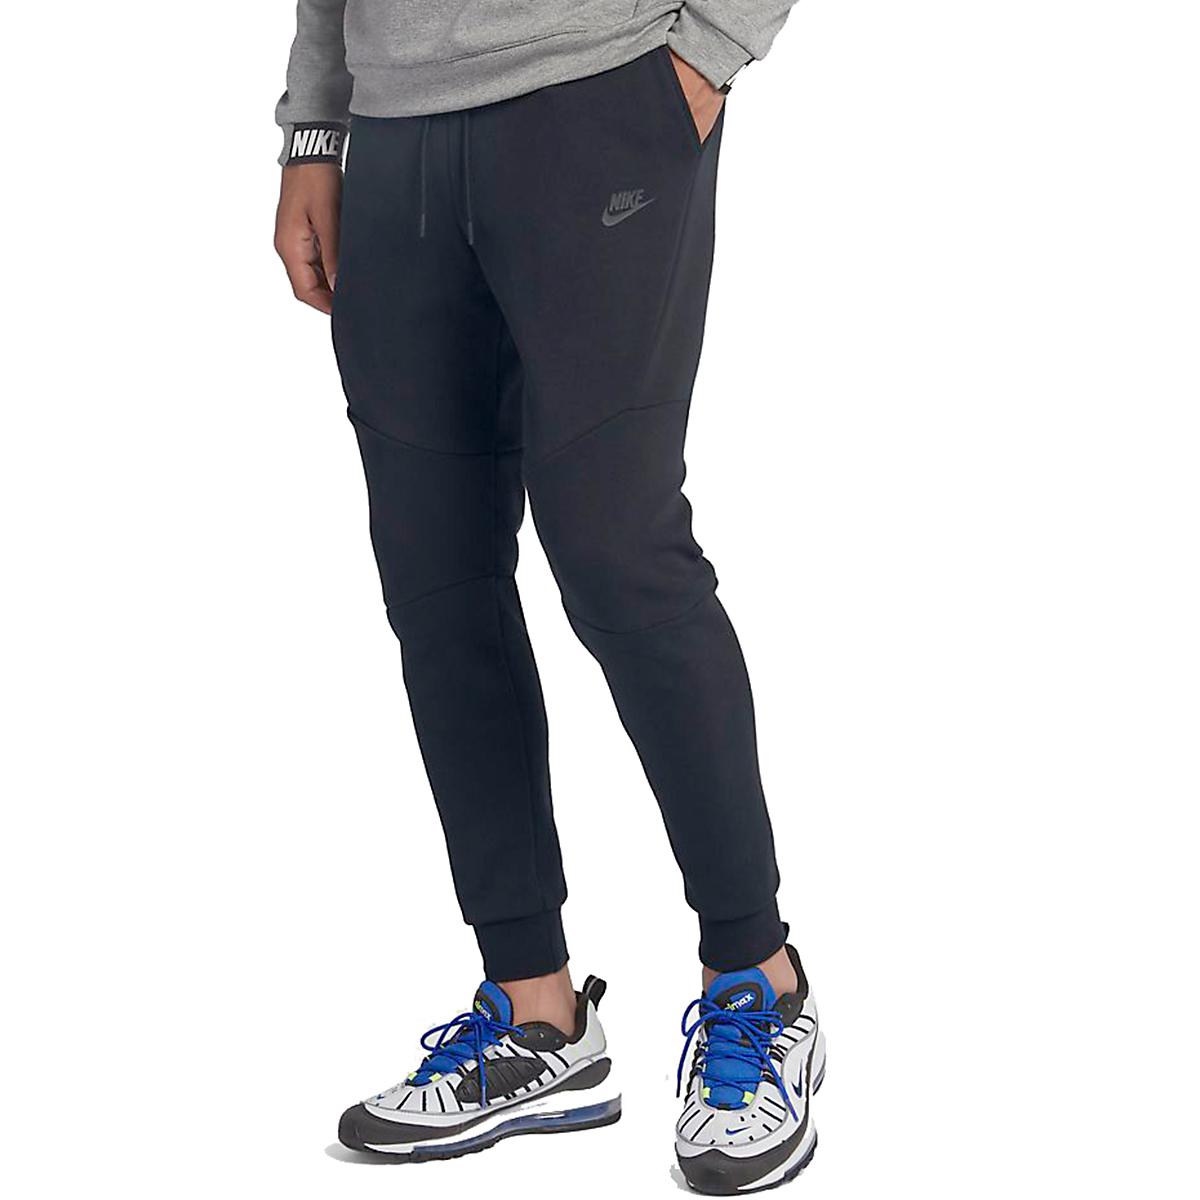 Men's Nike Tech Fleece Jogger - Color: Black - Size: L, Black, large, image 1